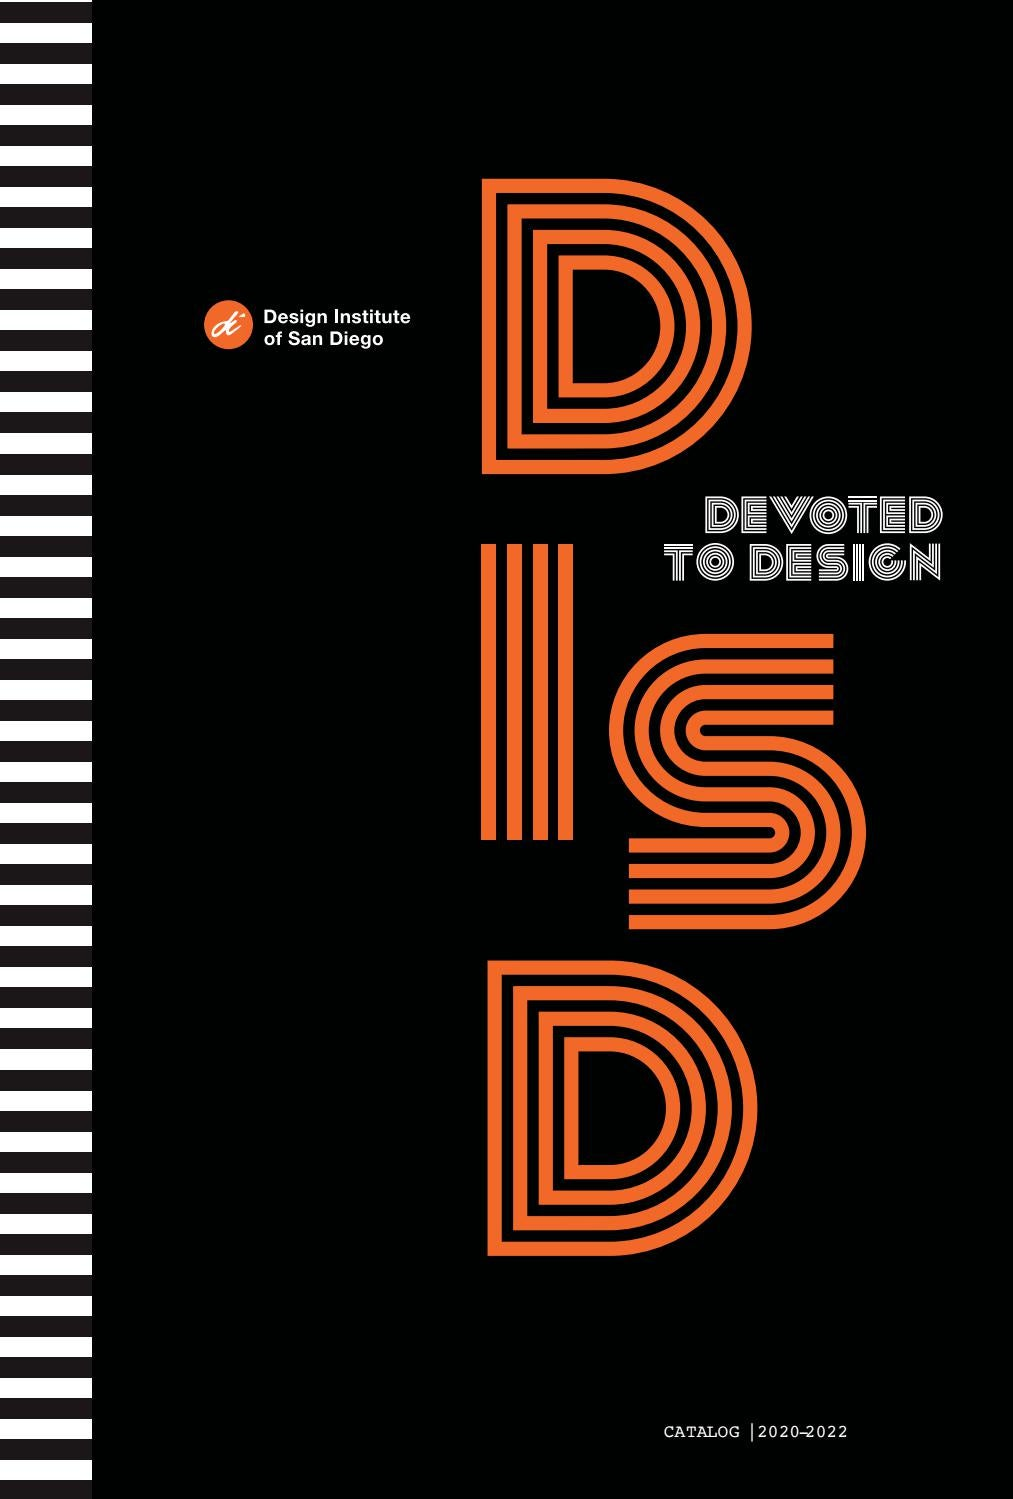 Rice Academic Calendar Spring 2022.Design Institute Of San Diego 2020 2022 Catalog By Disd Issuu